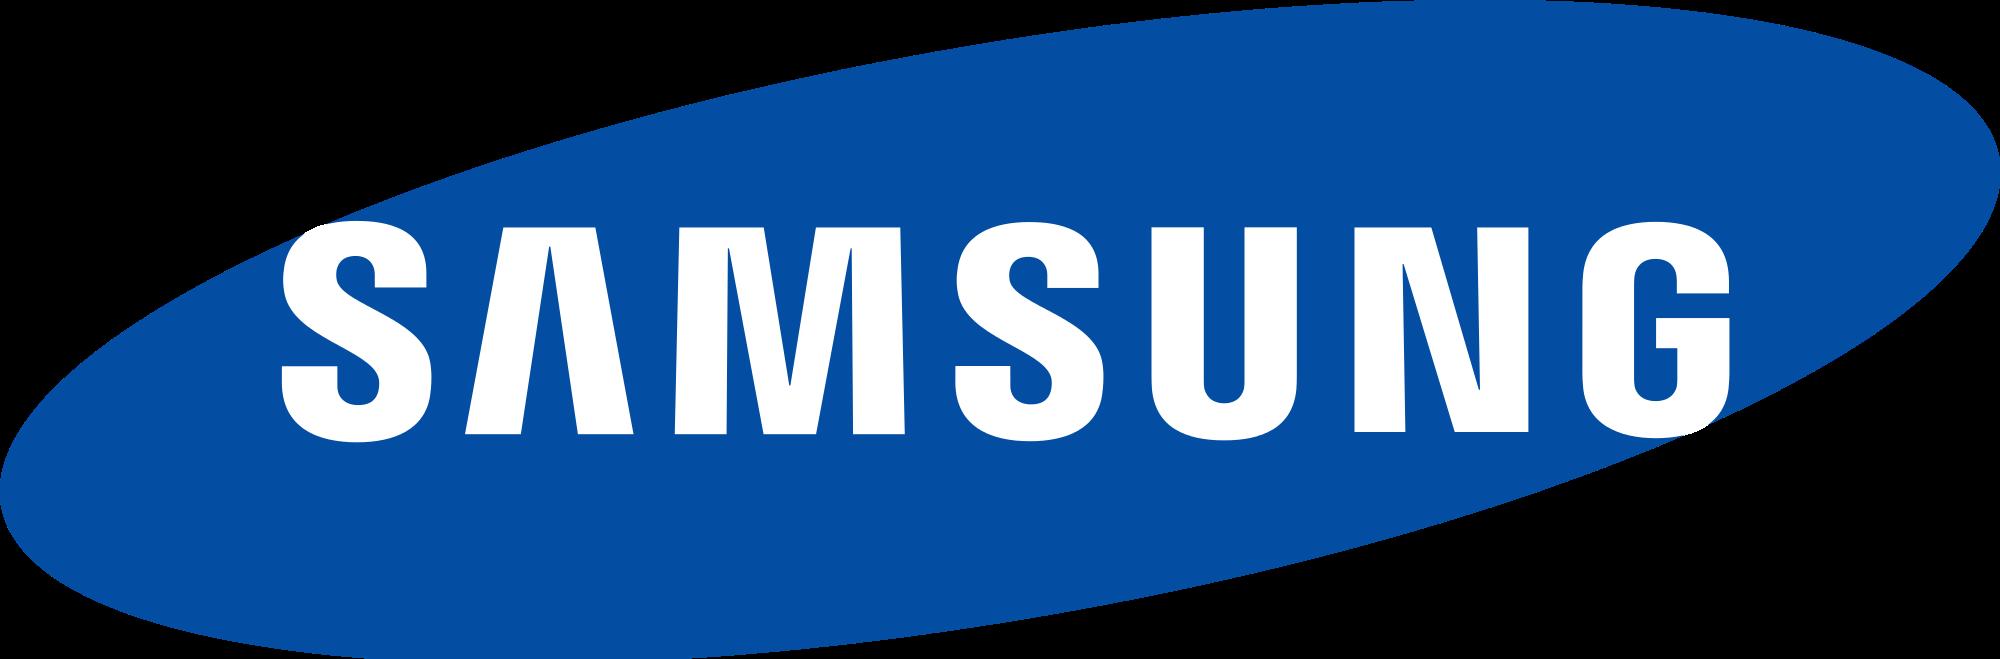 samsung_logo_PNG12